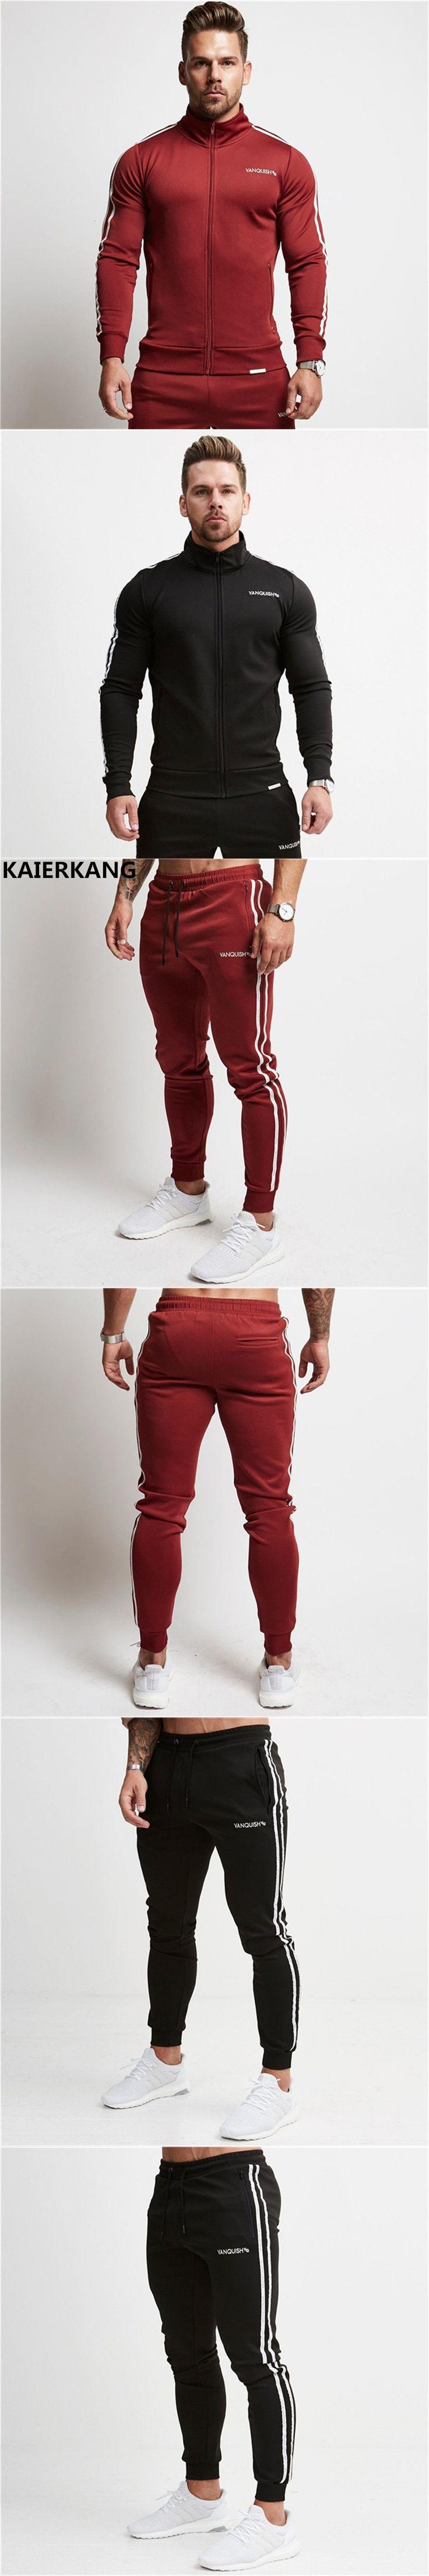 2017 Mens Joggers Male bodybuilding Casual Fashion Brand Joggers Sweatpants Bottom Snapback Pants men Casual  Pants M-2XL